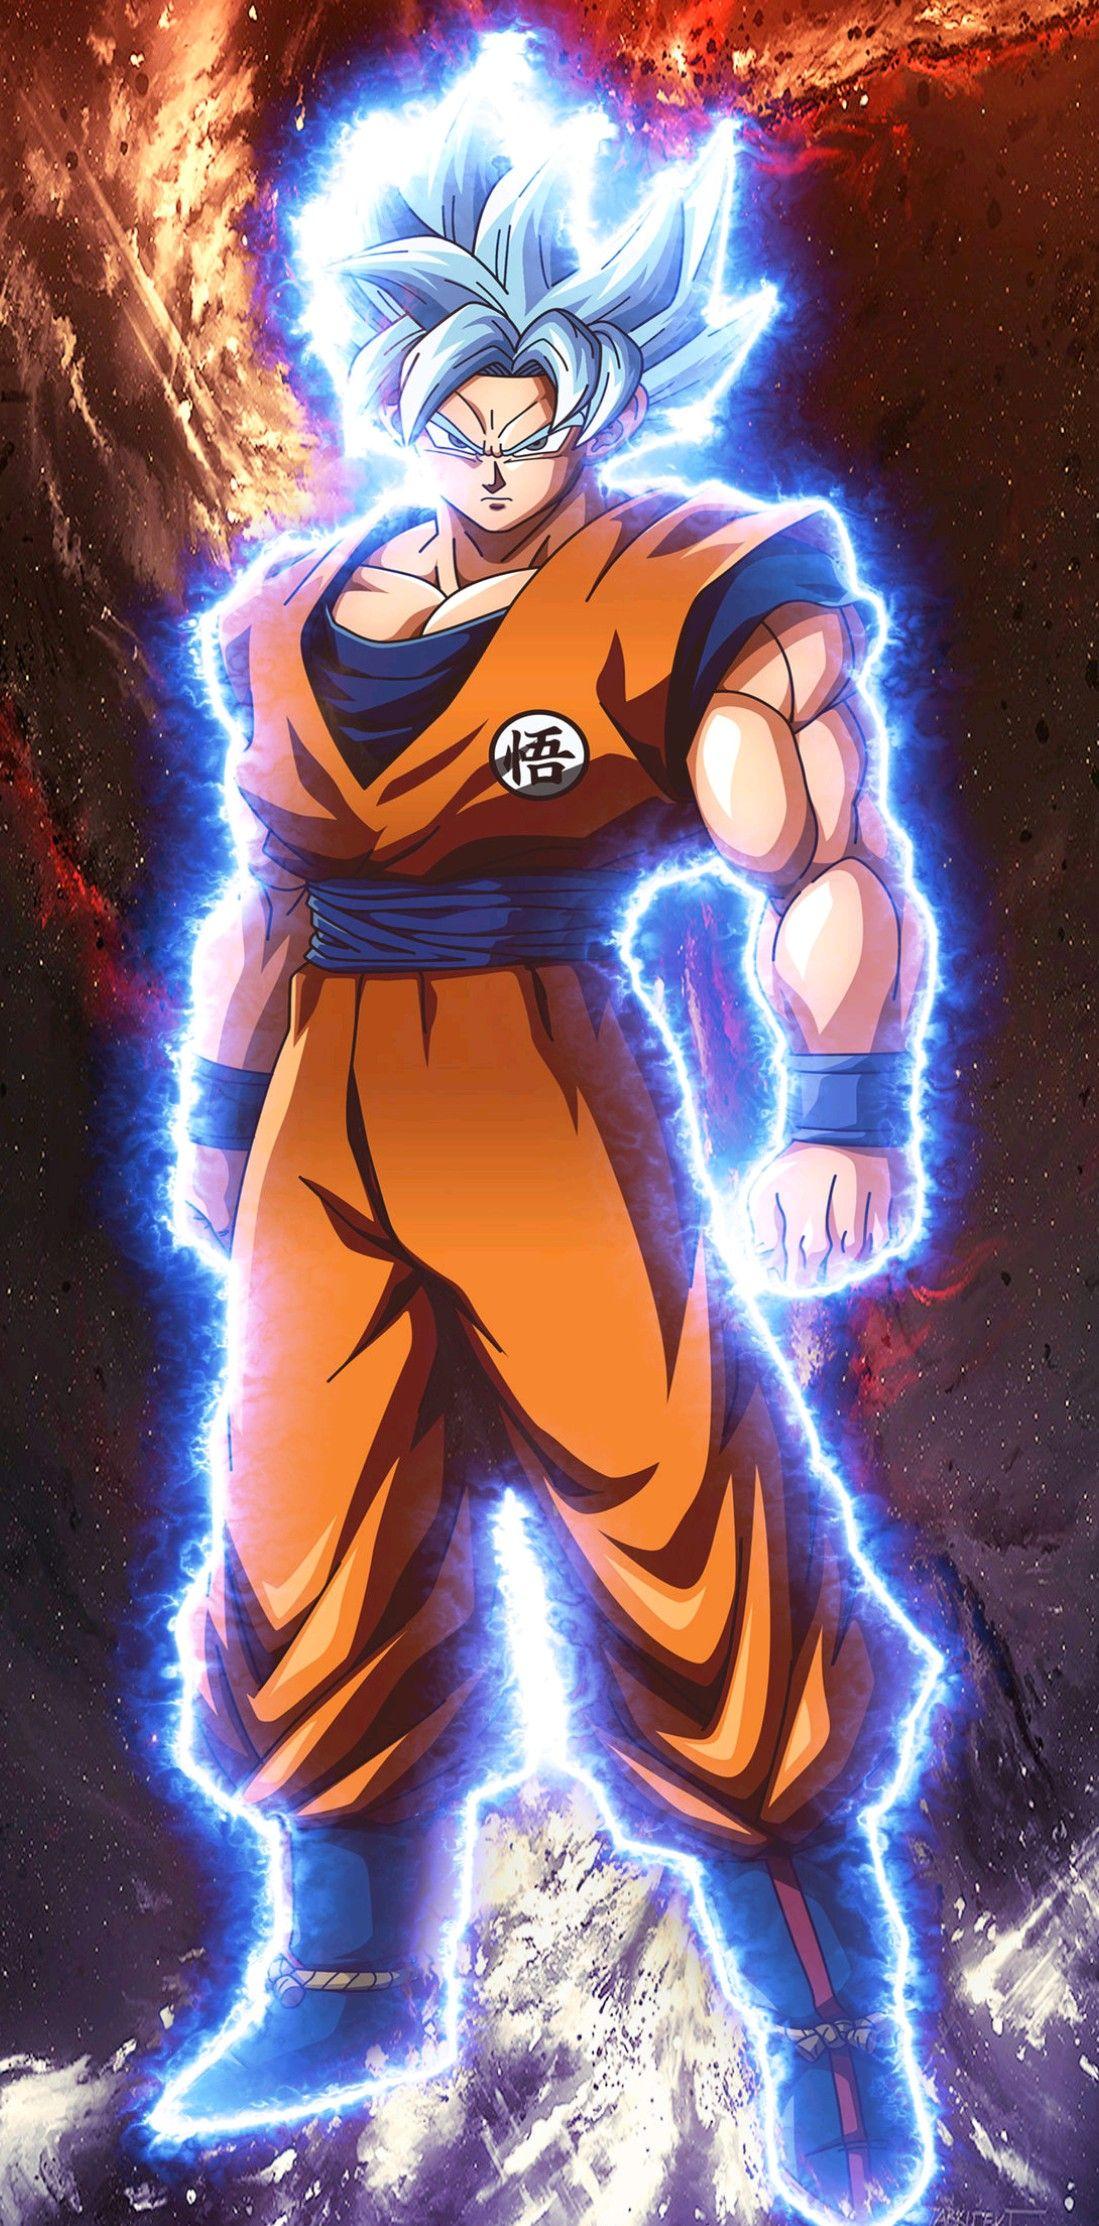 Goku Ultra Instinct Dragon Ball Super Anime Dragon Ball Super Dragon Ball Super Goku Anime Dragon Ball